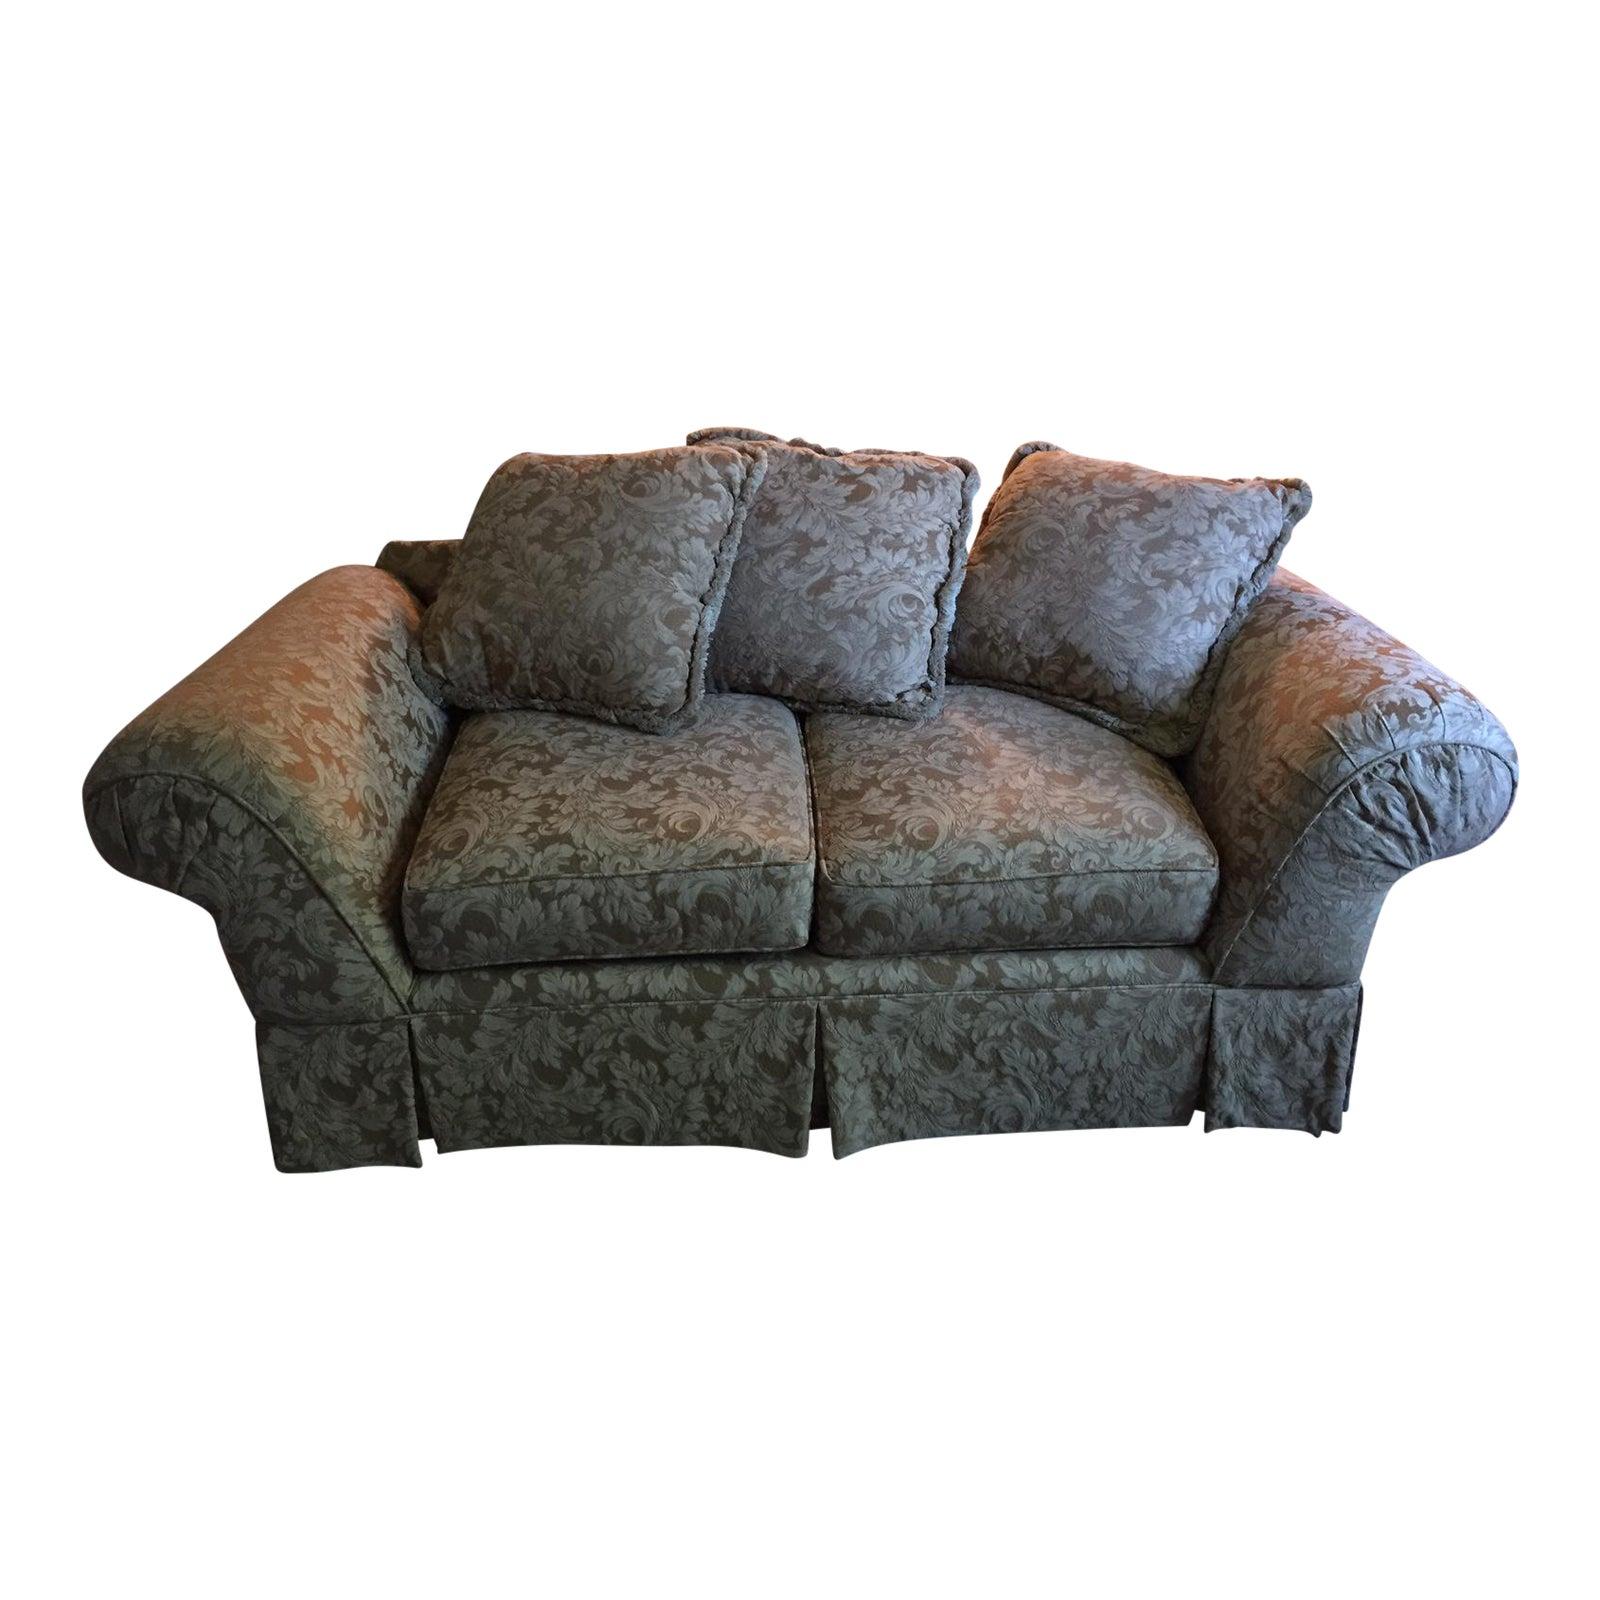 Enjoyable Hickory Hill Small Sofa Loveseat Machost Co Dining Chair Design Ideas Machostcouk